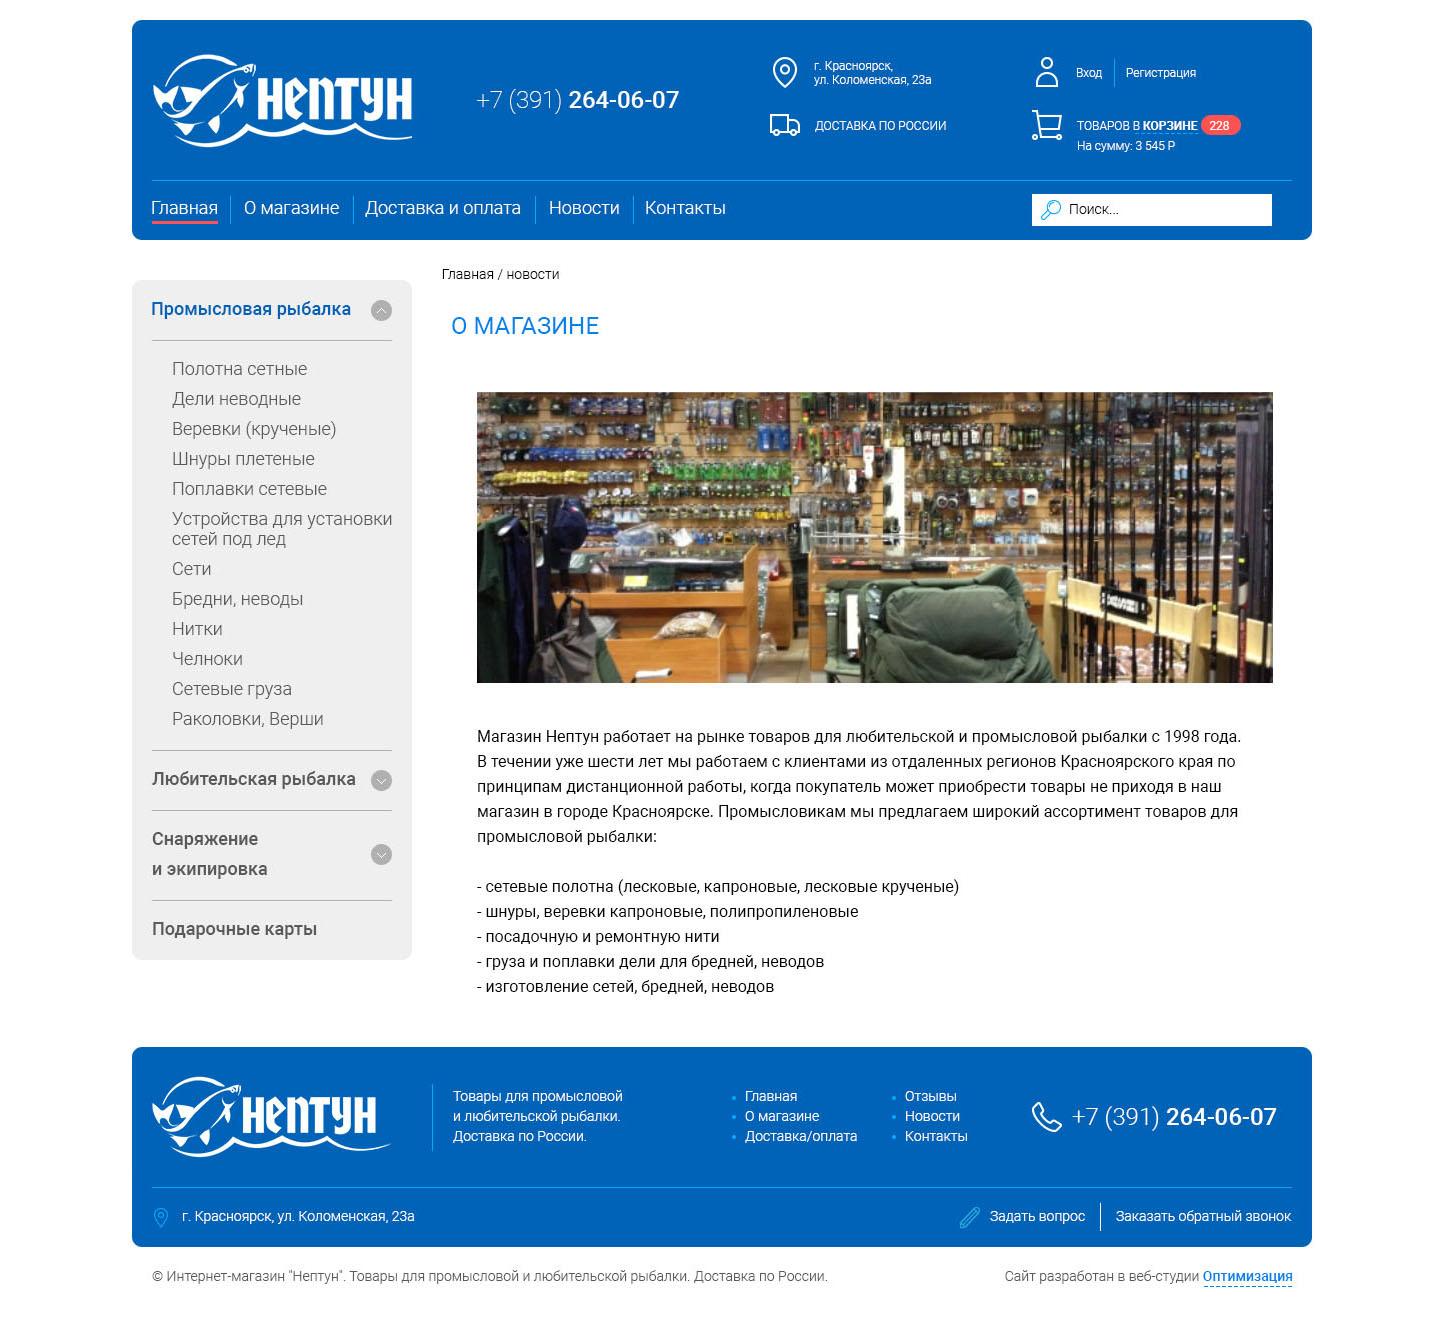 Интернет Магазин Нептун В Красноярске